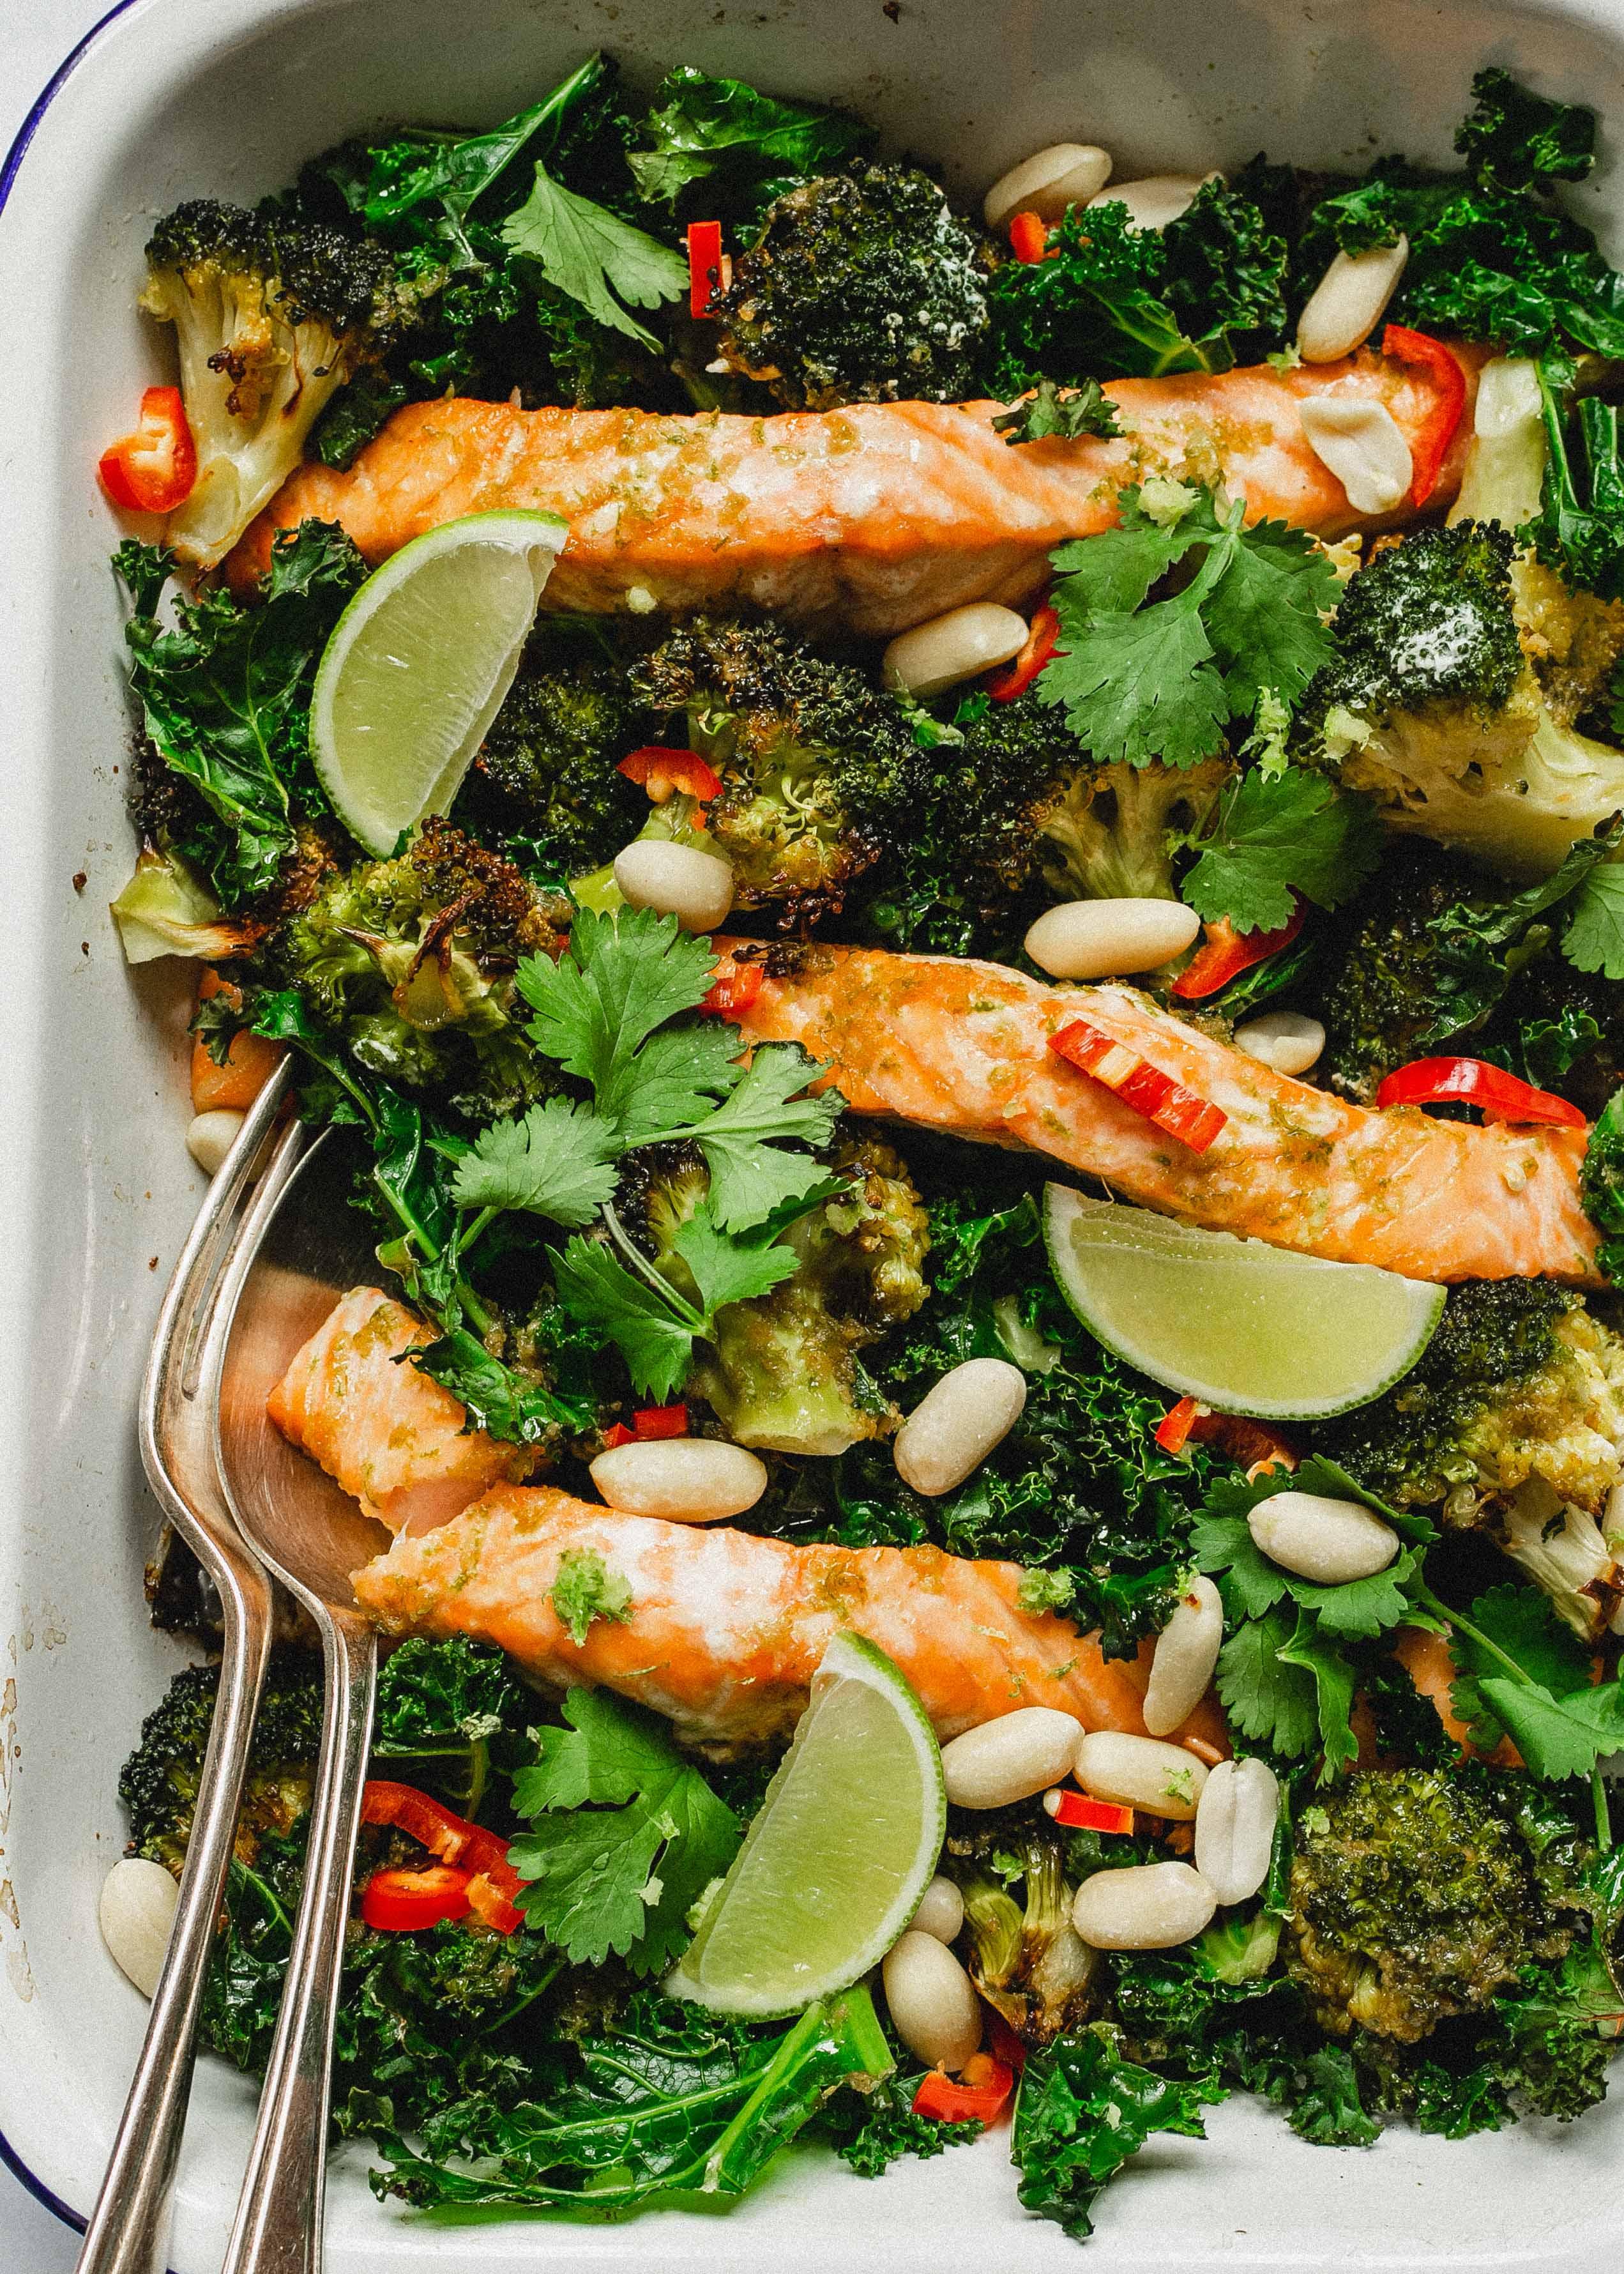 Low FODMAP roast salmon traybake with chilli and peanuts